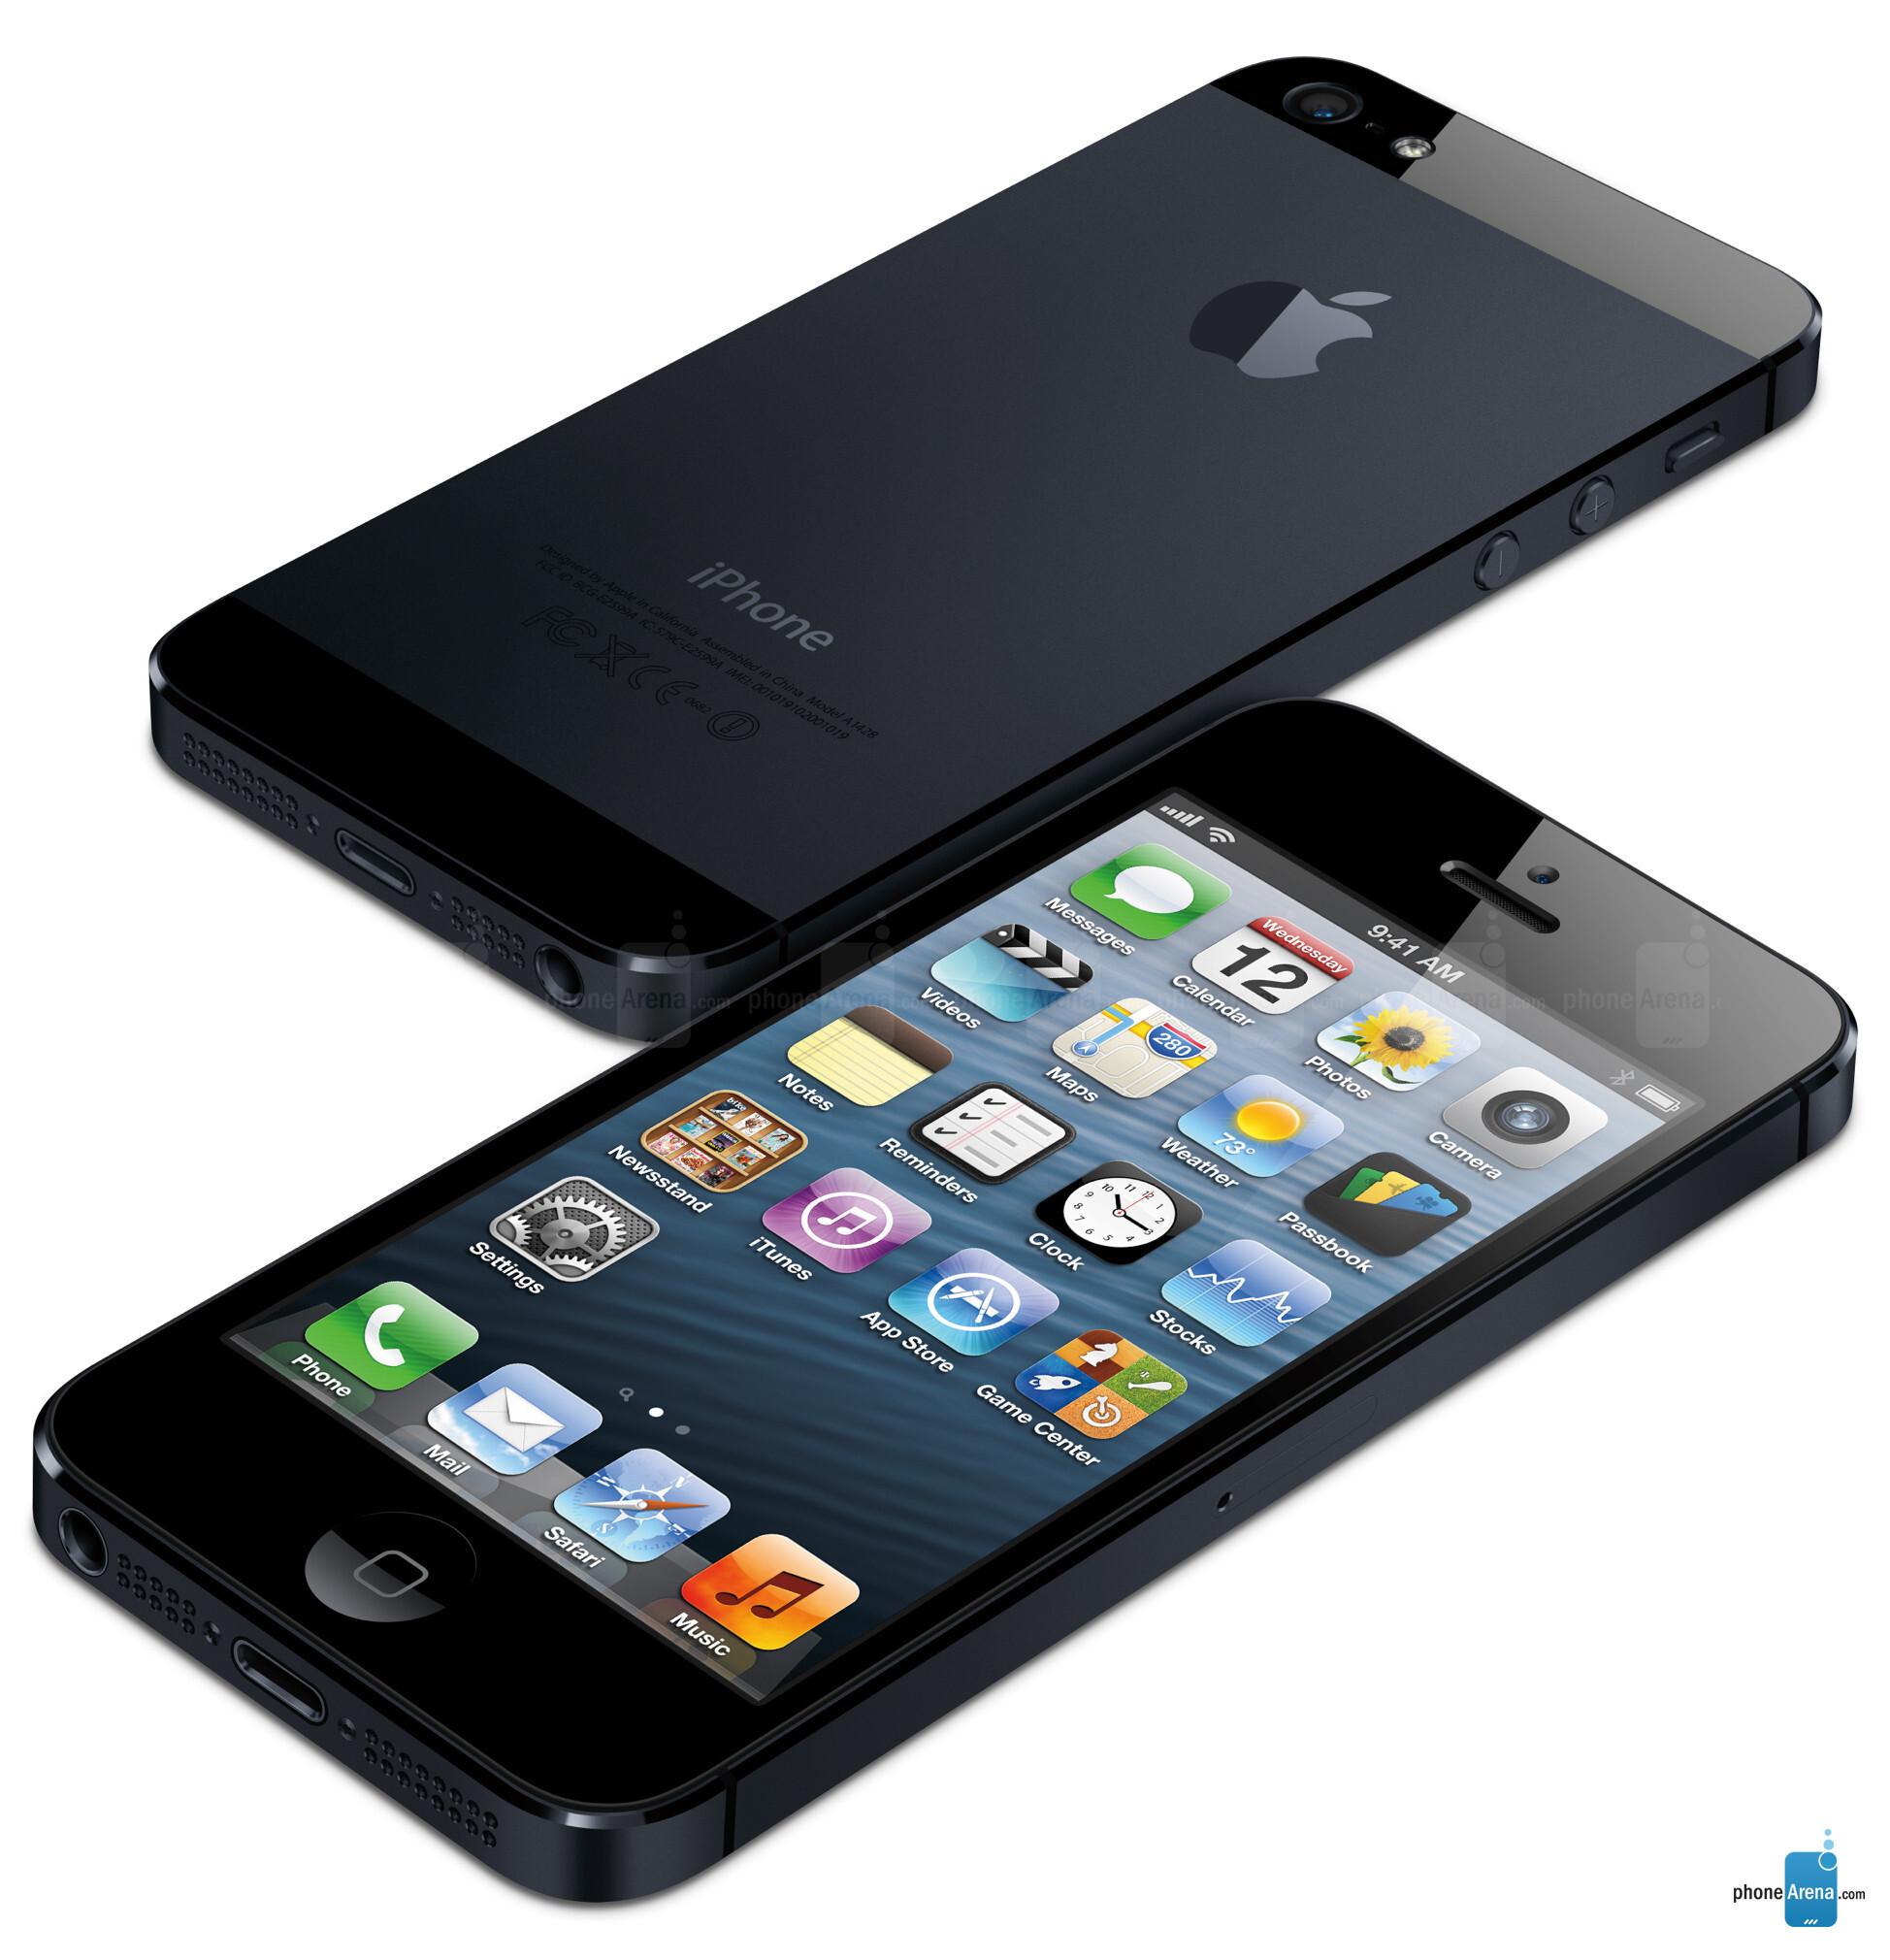 Apple IPhone 5 Featured In Best Multimedia